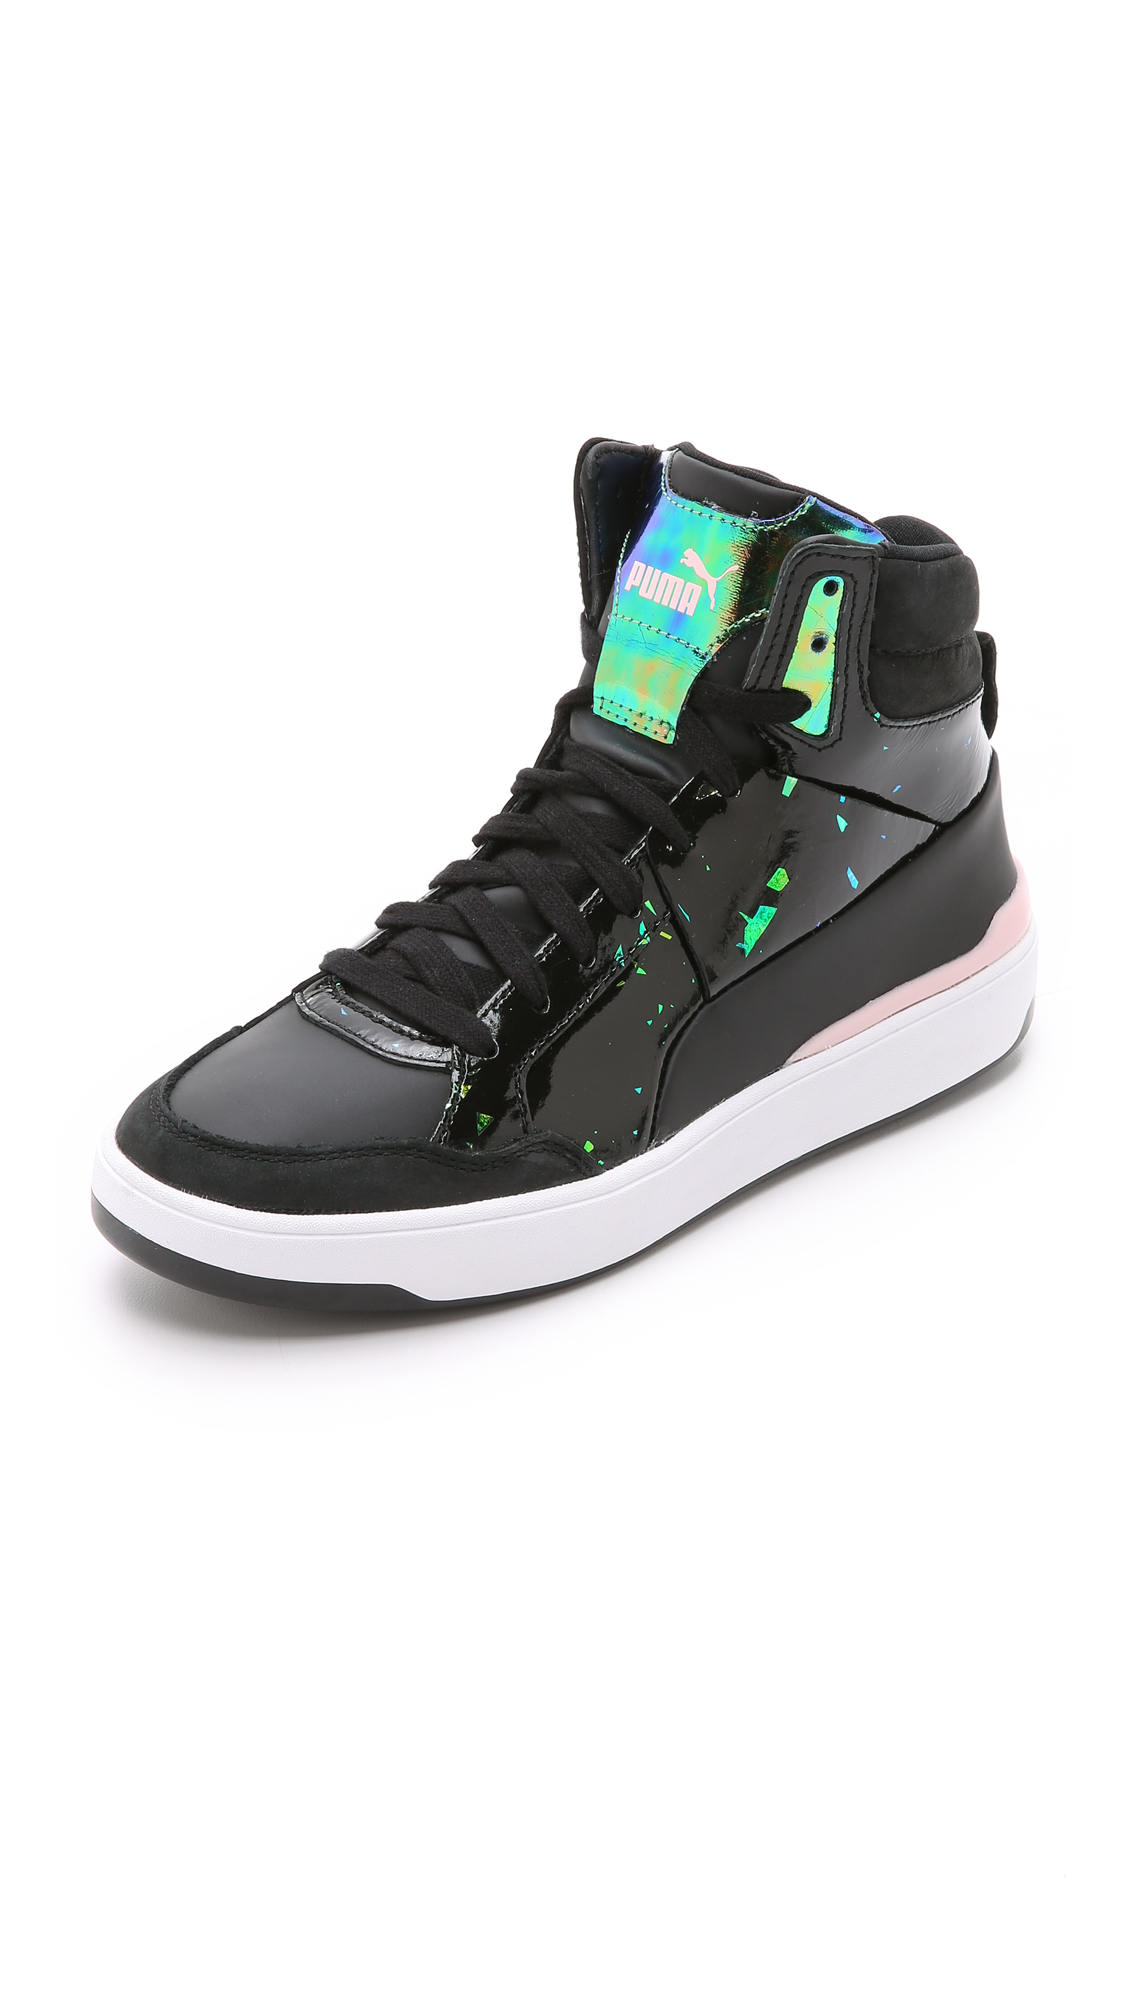 29a27392ed4f PUMA Mcq Brace Femme Mid Sneakers in Black - Lyst